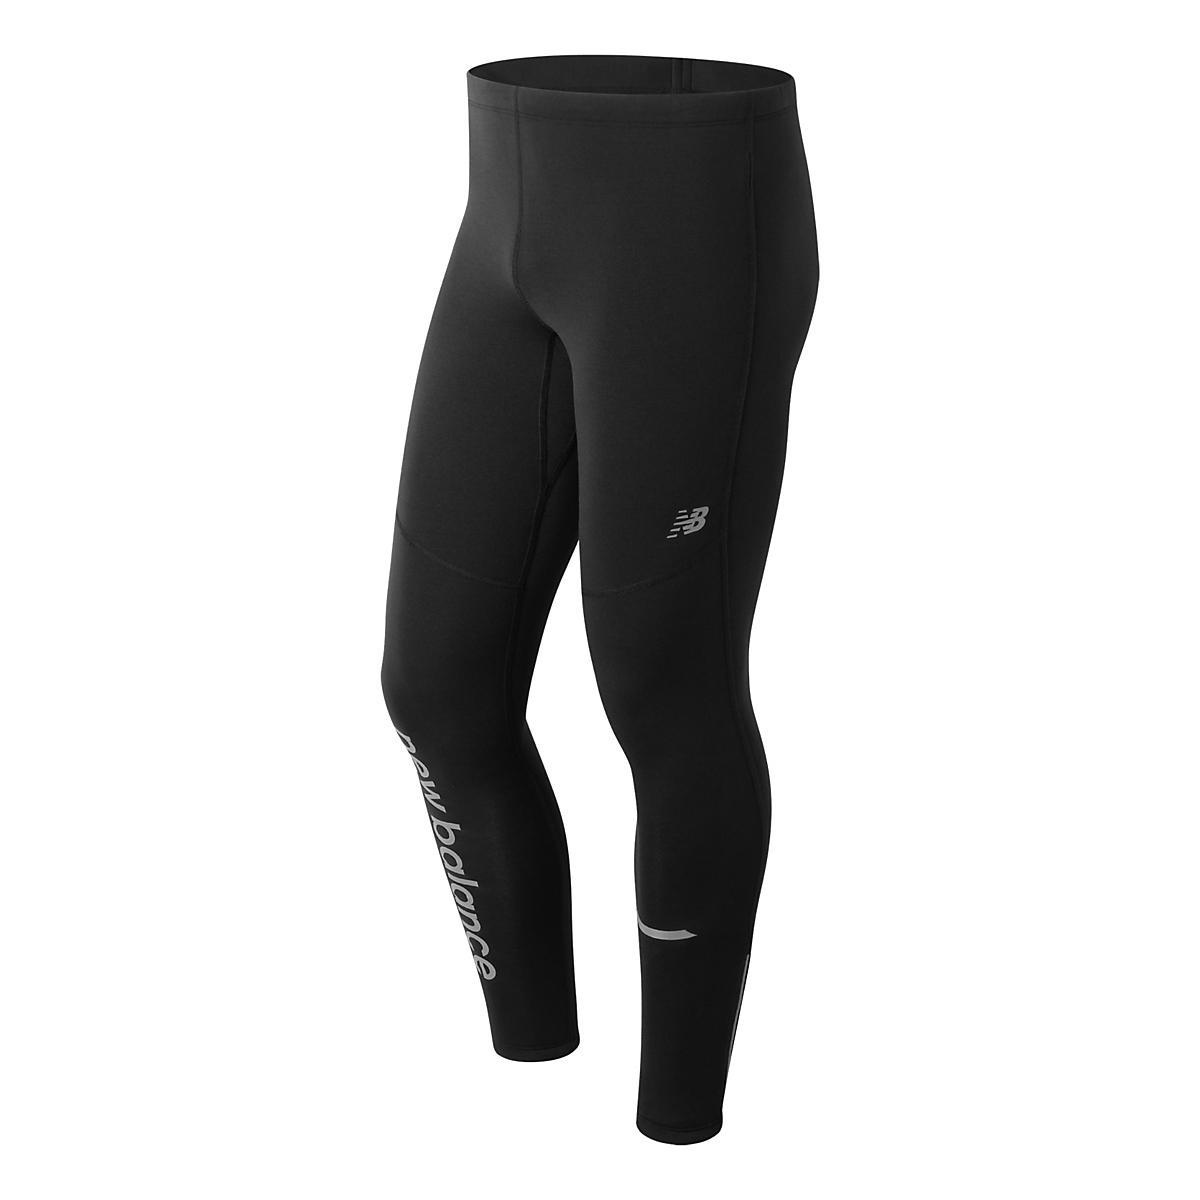 2089fc5e525f2 Mens New Balance Performance Merino Tights & Leggings Pants at Road Runner  Sports